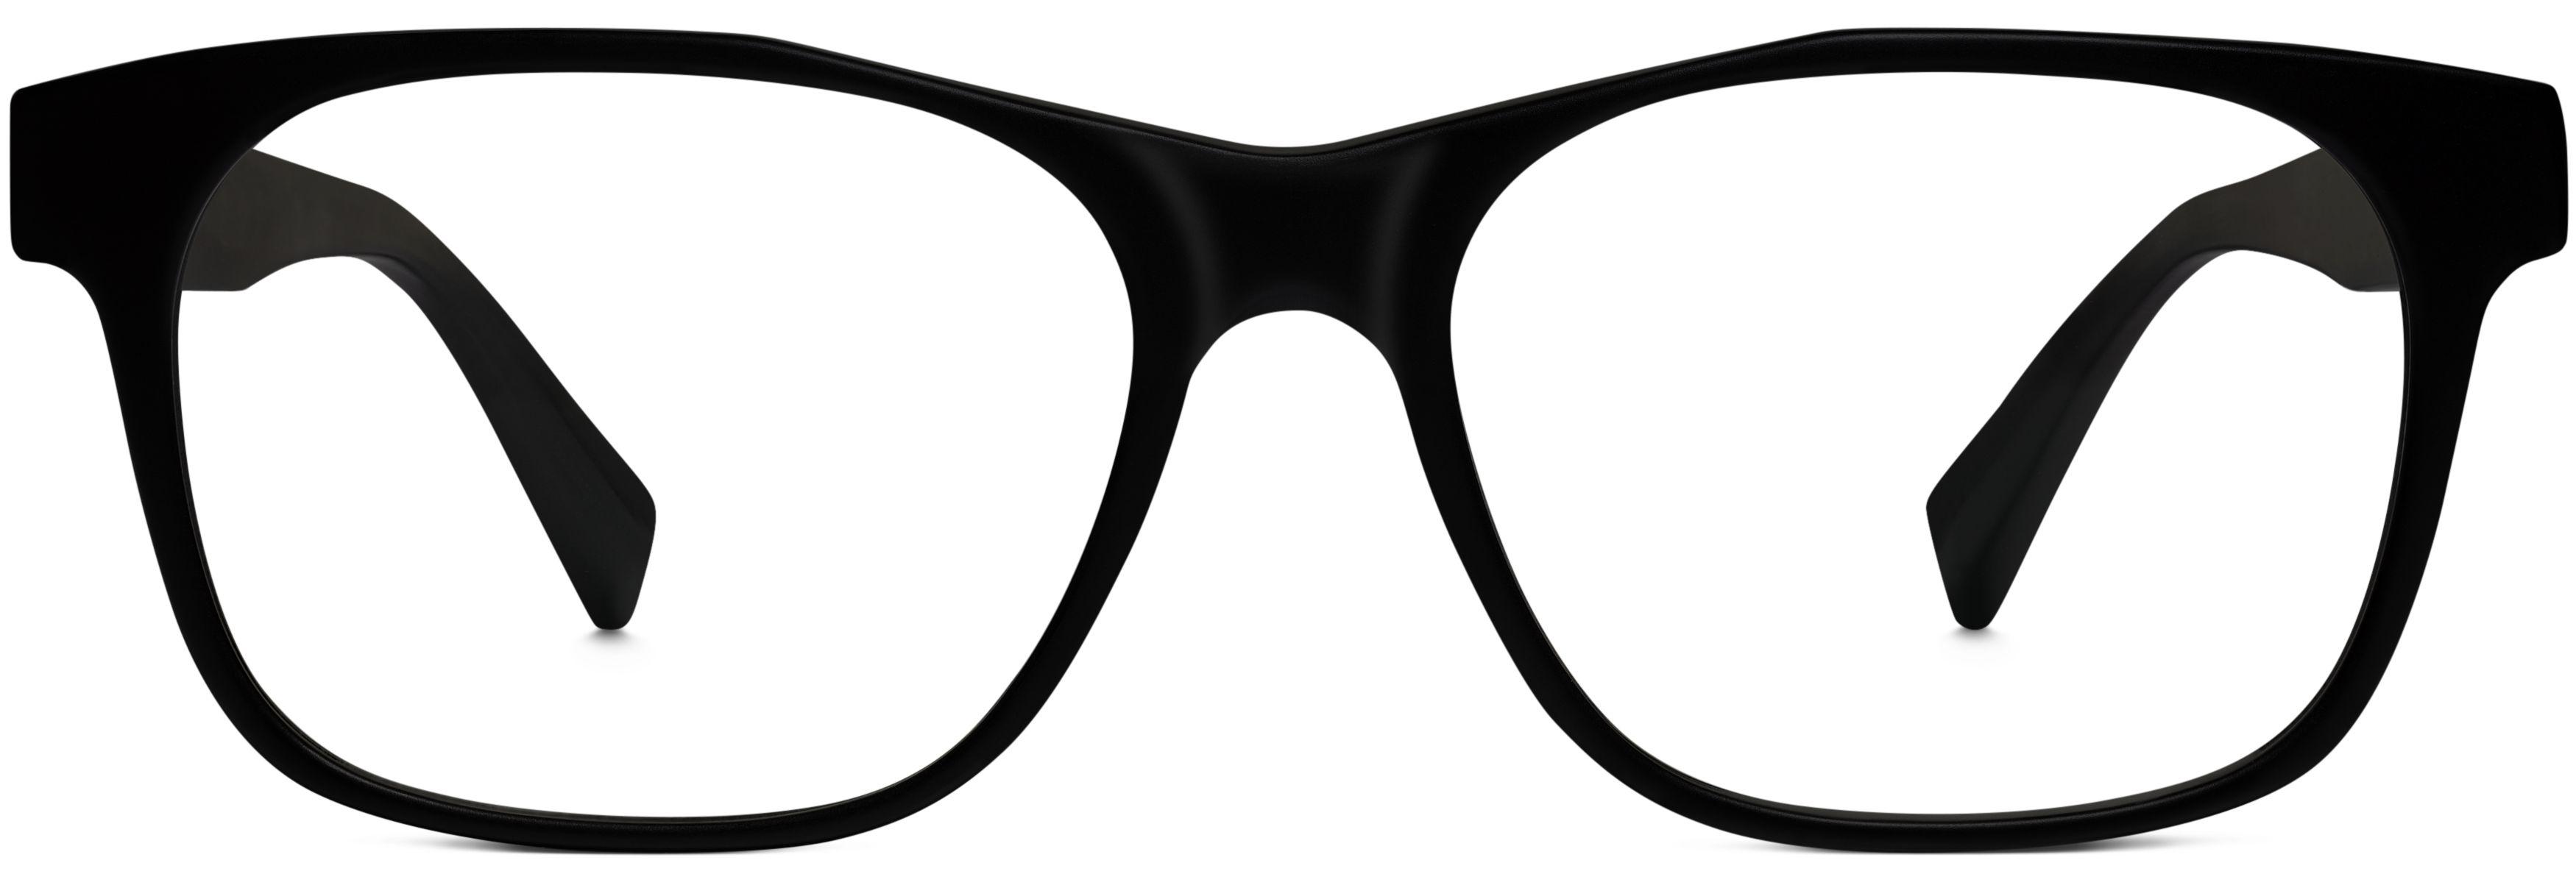 d8a5812f19e Everson Eyeglasses in Jet Black Matte for Men